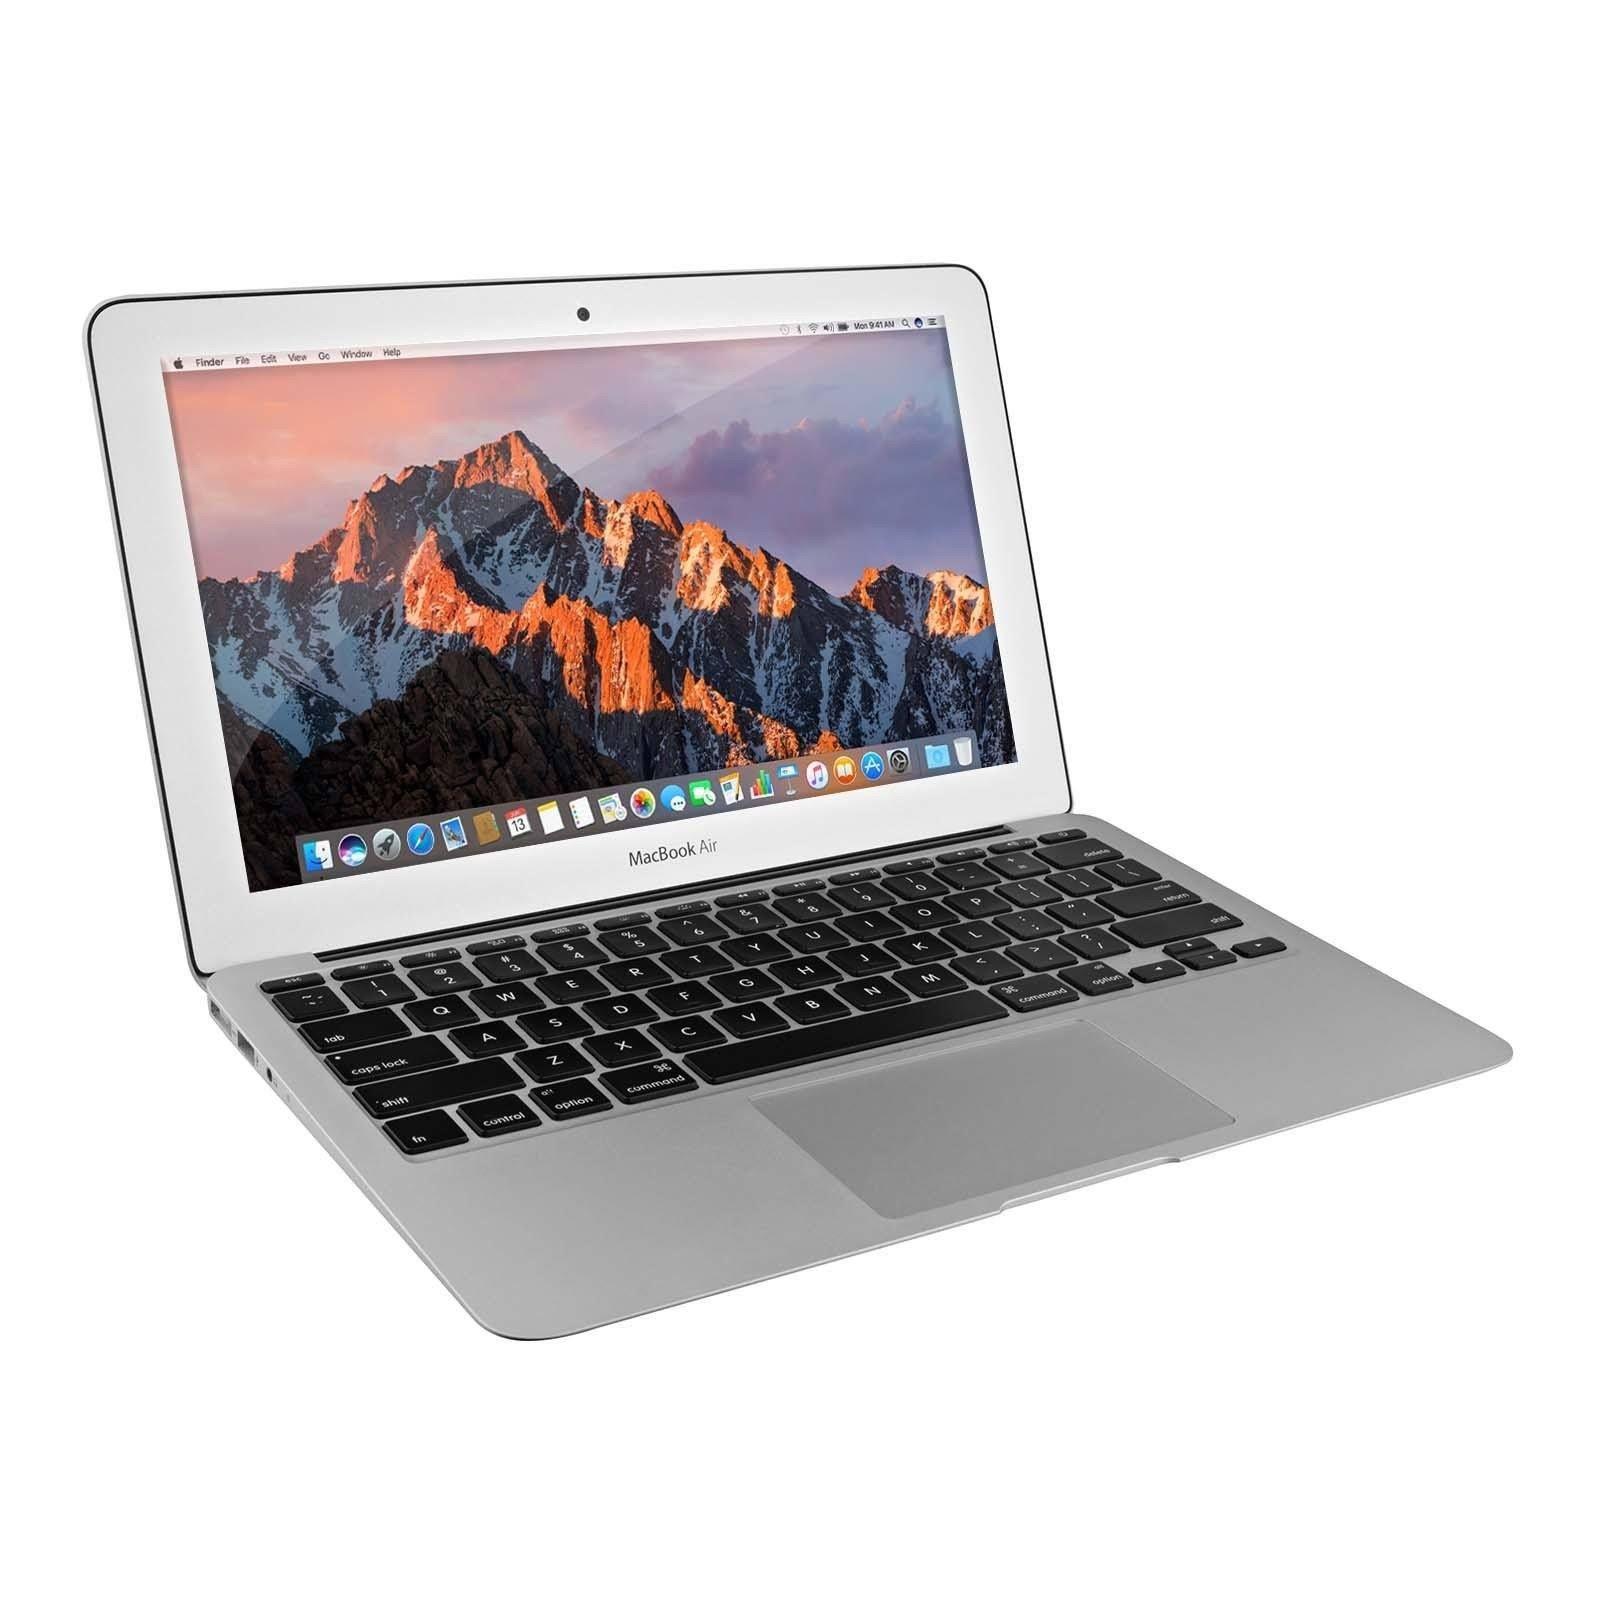 "Apple MacBook Air 11.6"" HD, Intel Core i5, 8GB RAM, 128GB"